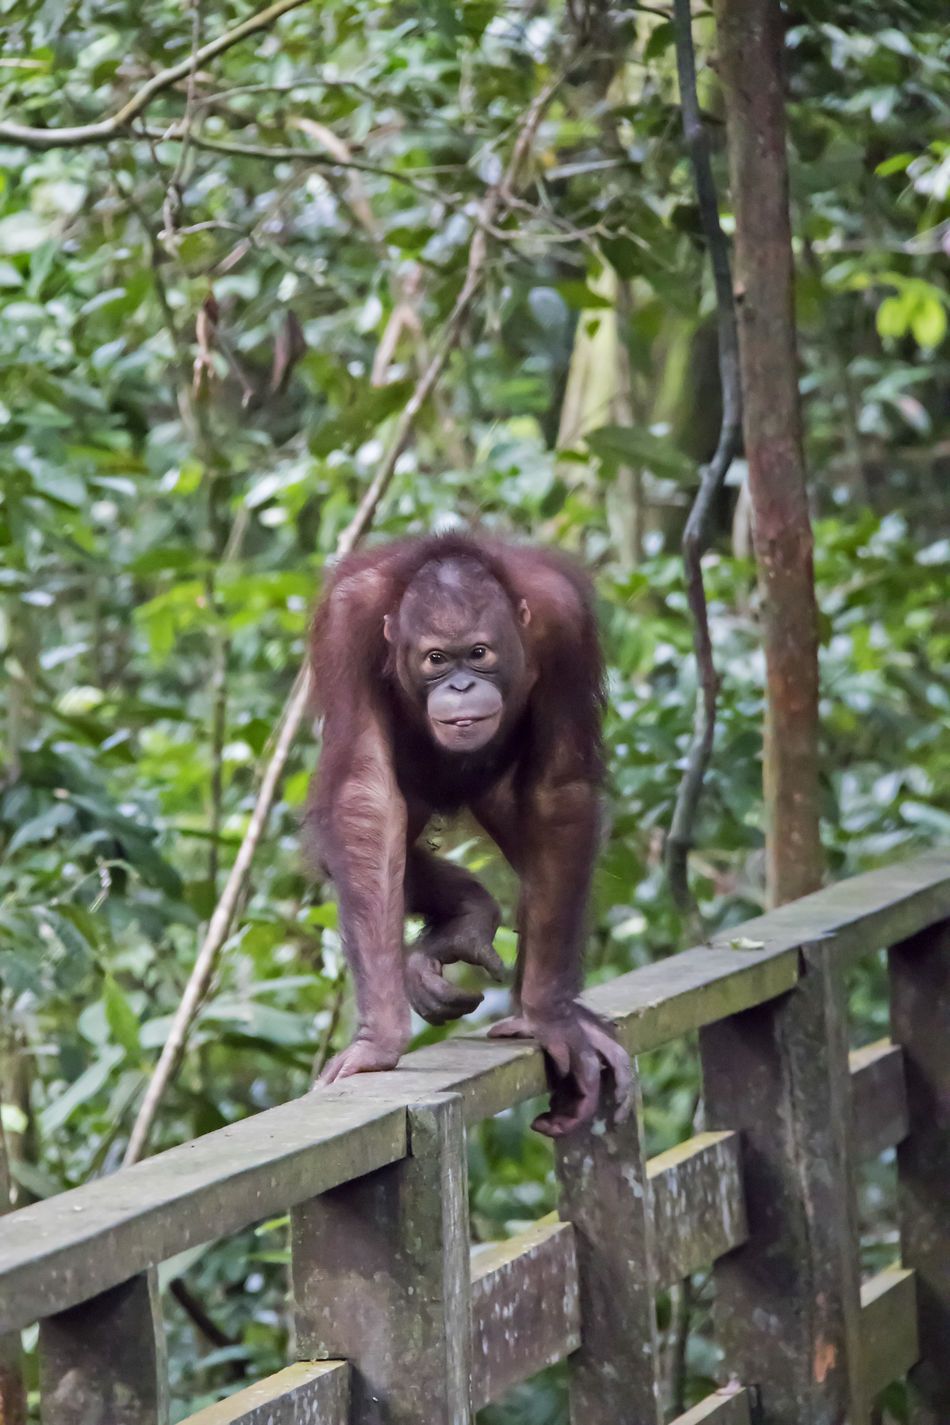 The Bornean orangutan (Pongo pygmaeus) is an endangered species due to habitat loss to Palm Oil Plantations Animal Themes Animal Wildlife Animals In The Wild Day Endangered Animals Endangered Species Mammal Monkey Nature No People One Animal Orangutan Outdoors Tree